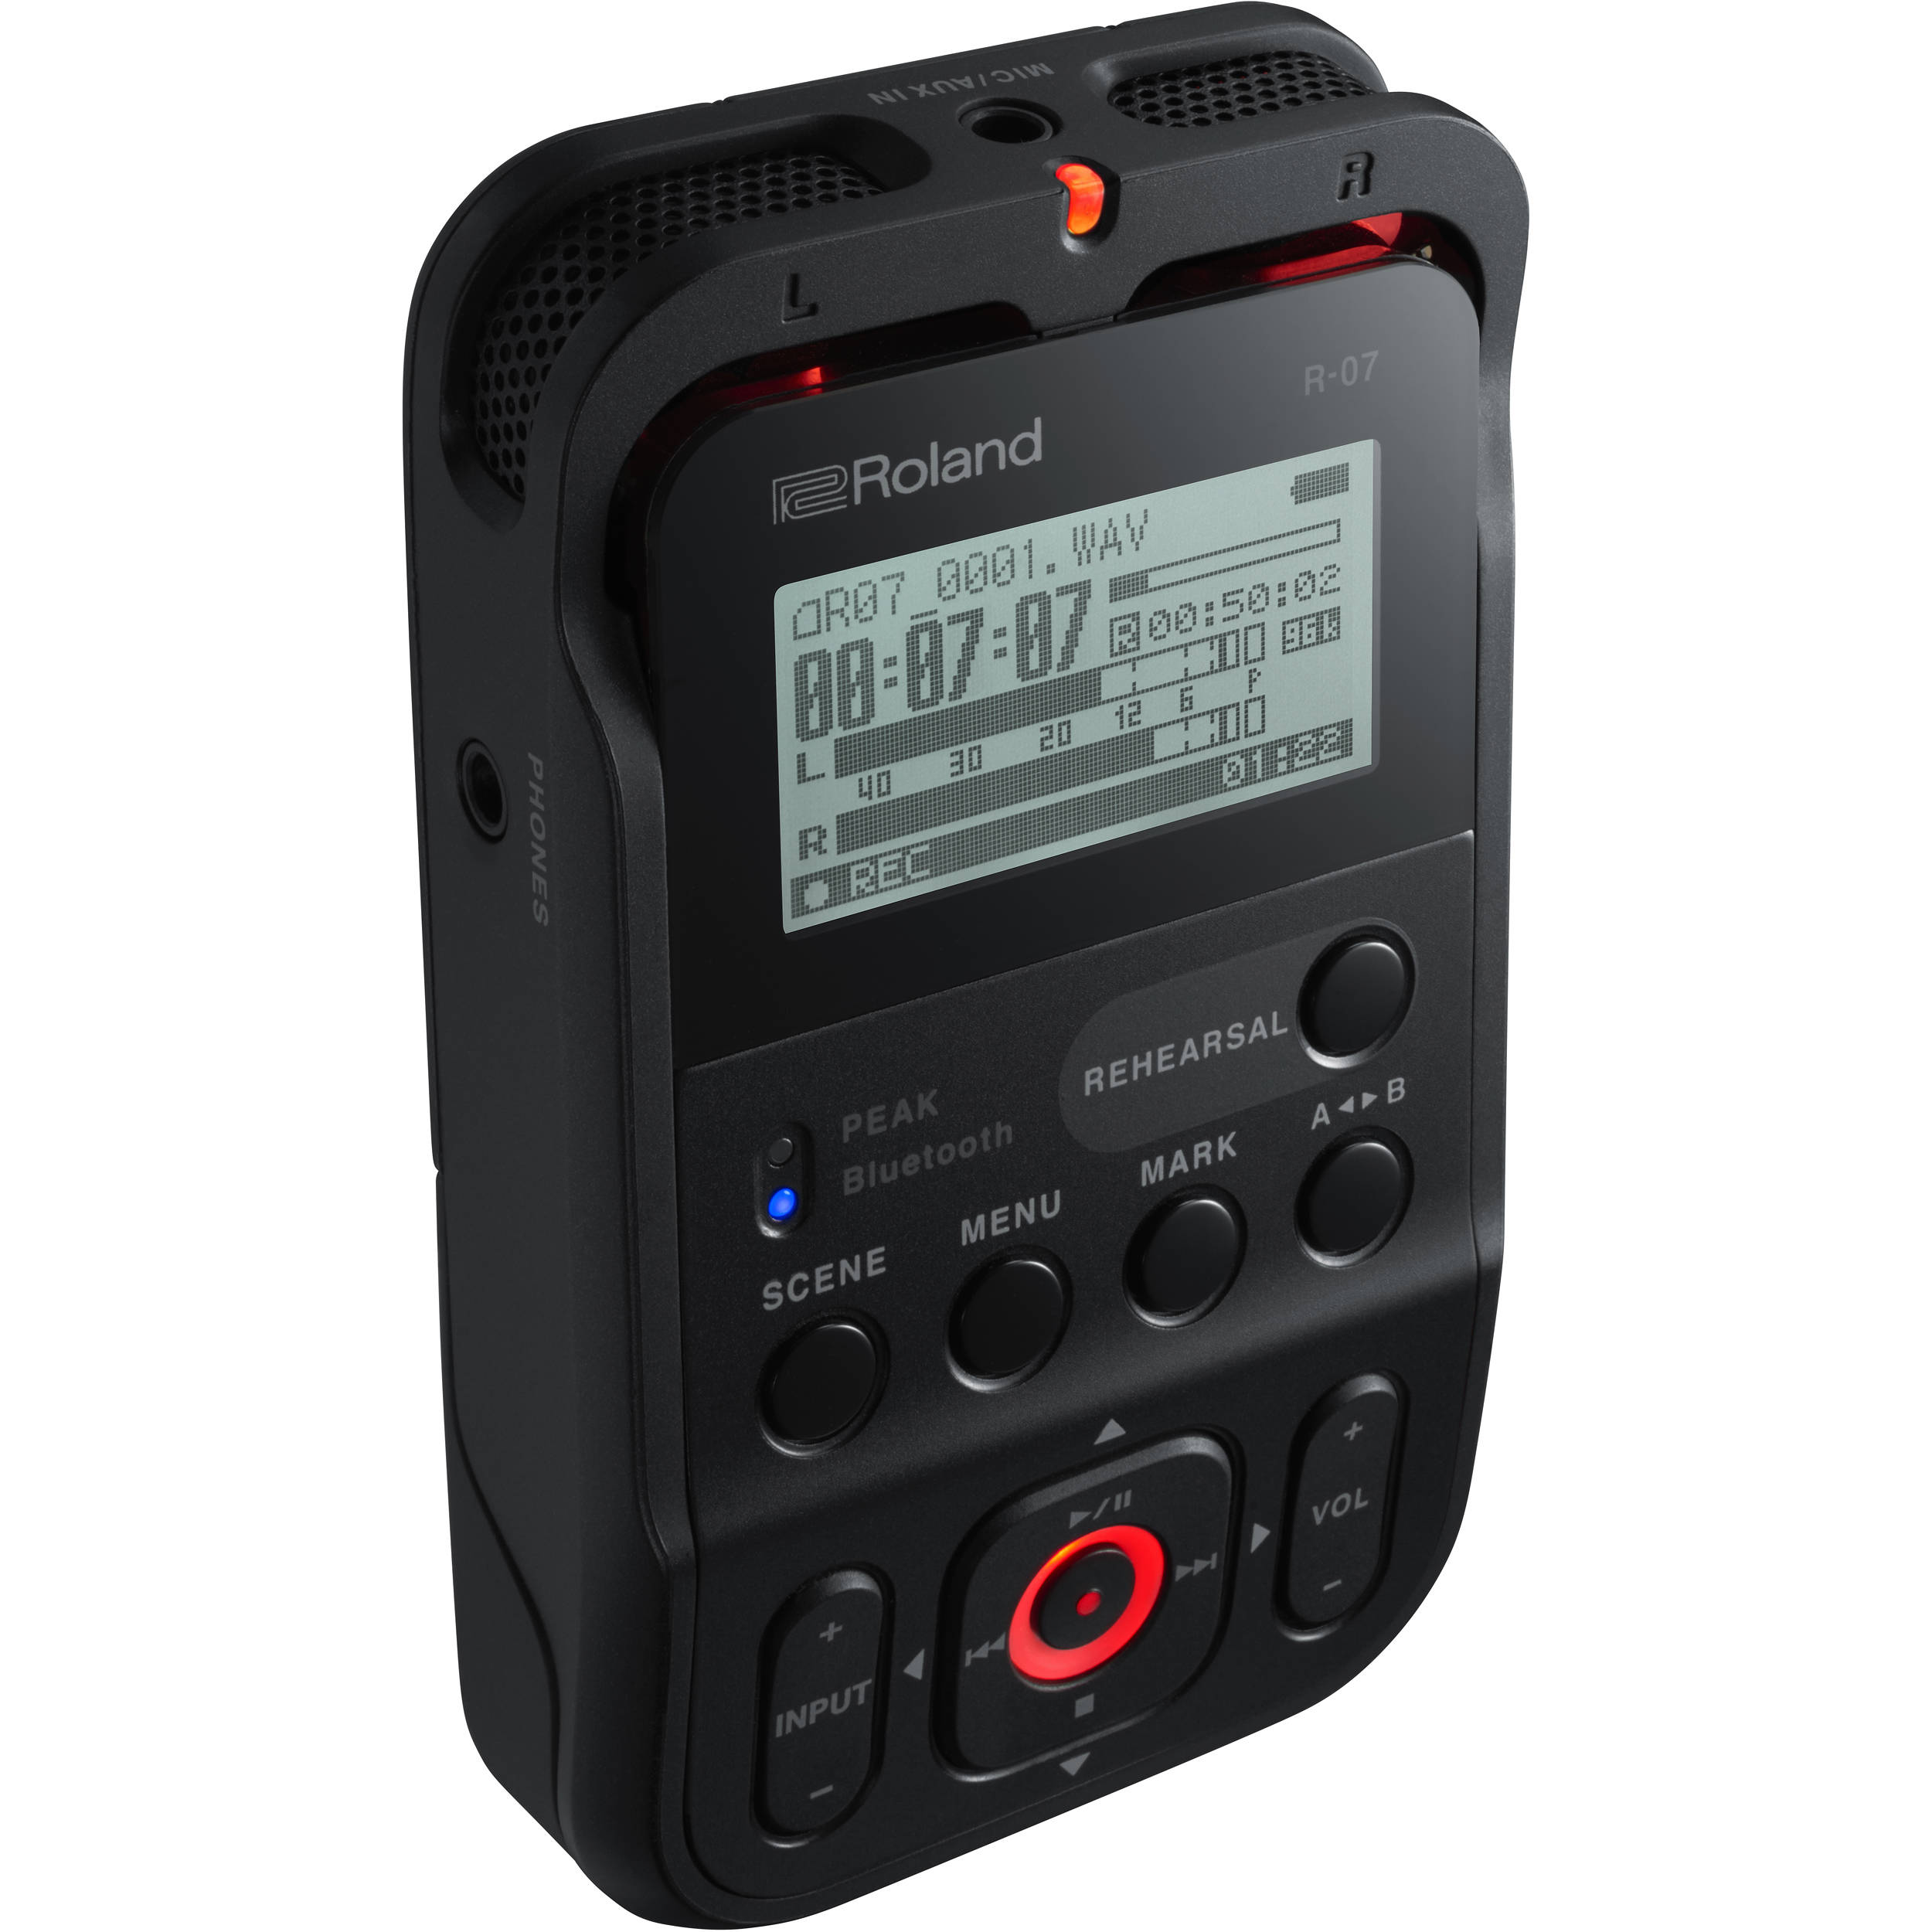 roland r 07 portable audio recorder black r 07 bk b h photo. Black Bedroom Furniture Sets. Home Design Ideas